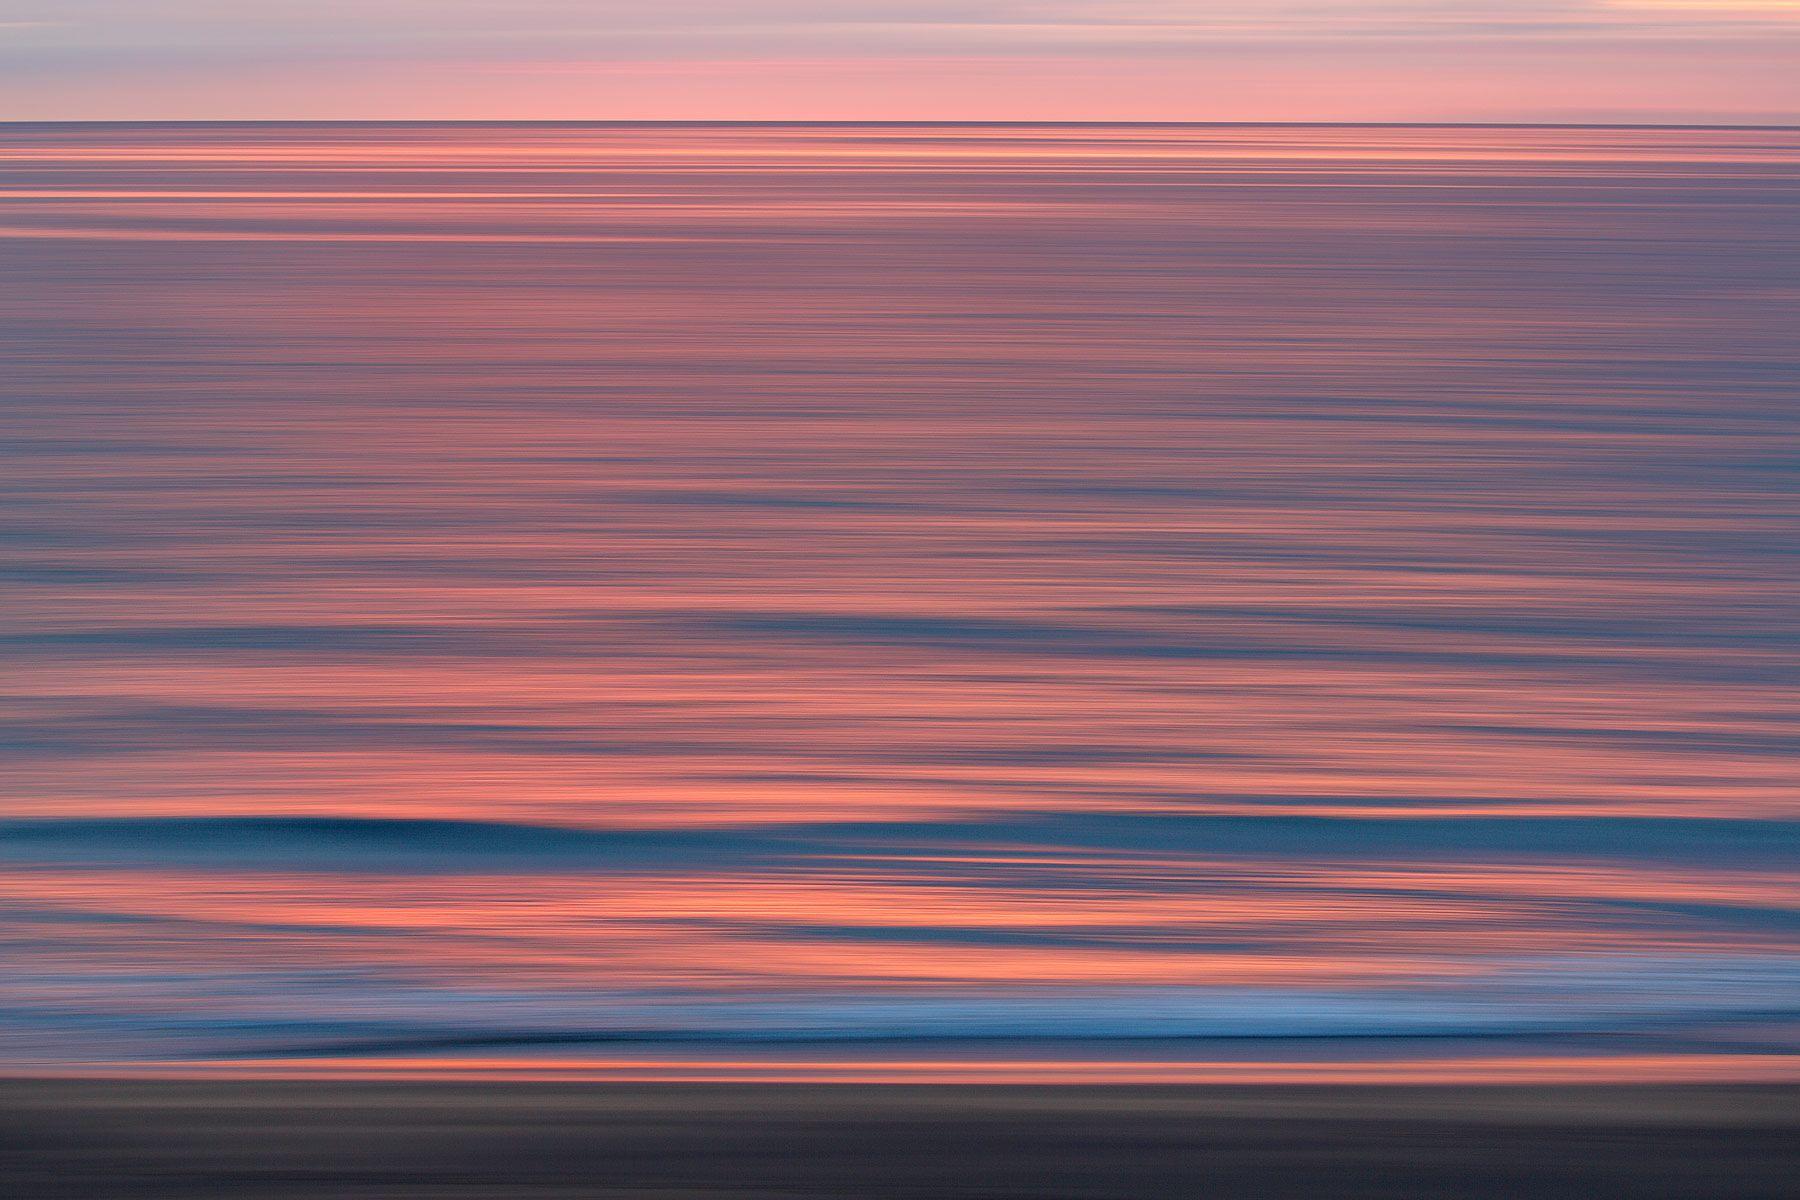 Sunset-reflection-and-beach-blur-II_S6A7315-Skardavik,-West-Iceland.jpg